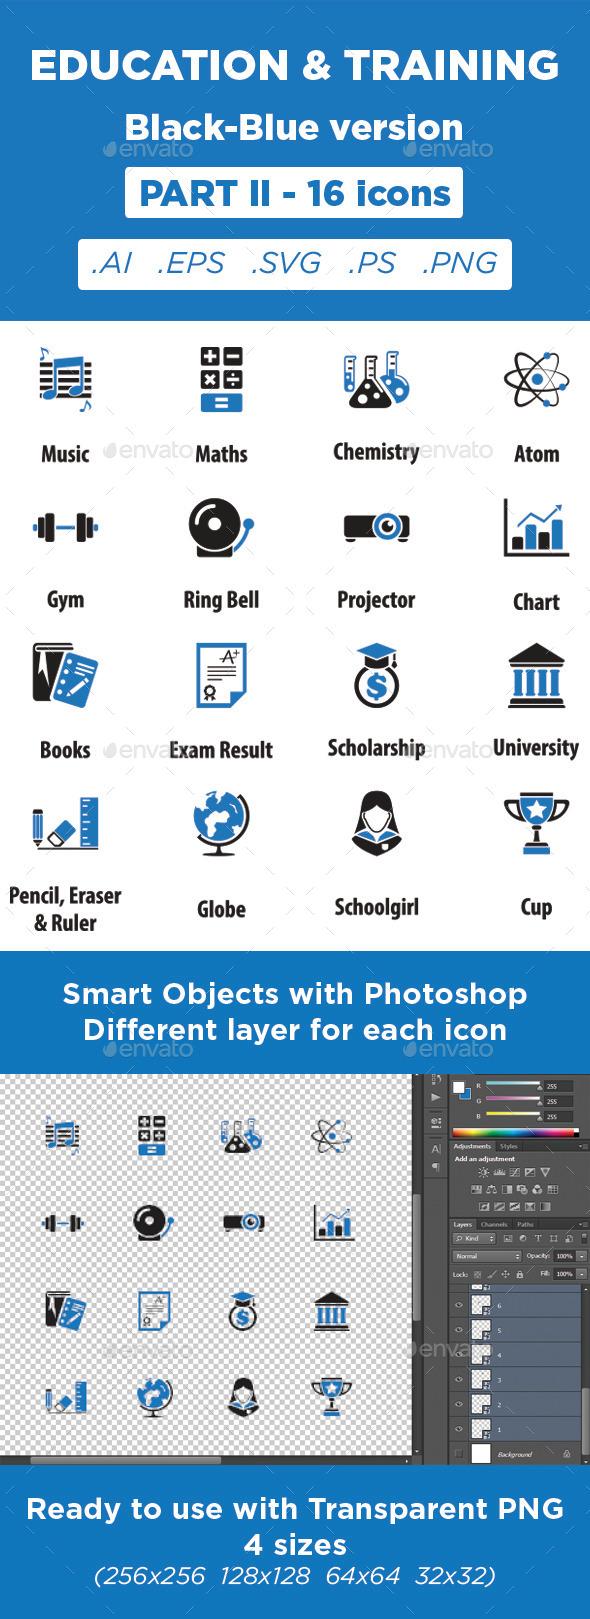 GraphicRiver Education & Training Icons Black-Blue Part 2 11373082